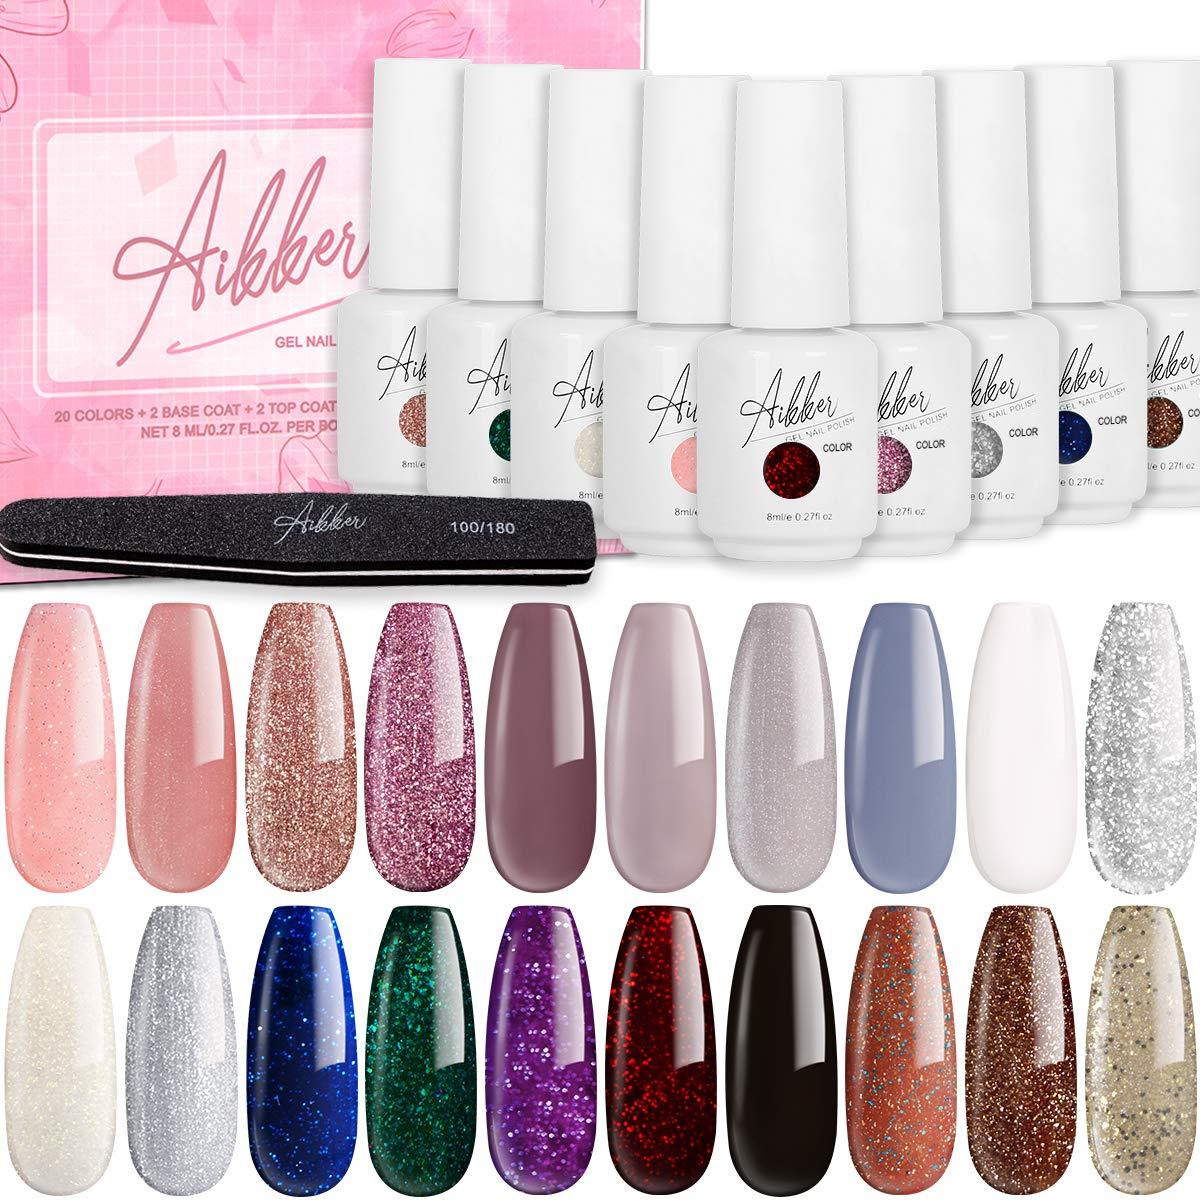 Aikker 20+5 Gel Nail Polish Kit 20 Colors 8ml Soak Off UV Nail Gel with Base and No Wipe Top Coat for Nail Salon Grace Set AK24